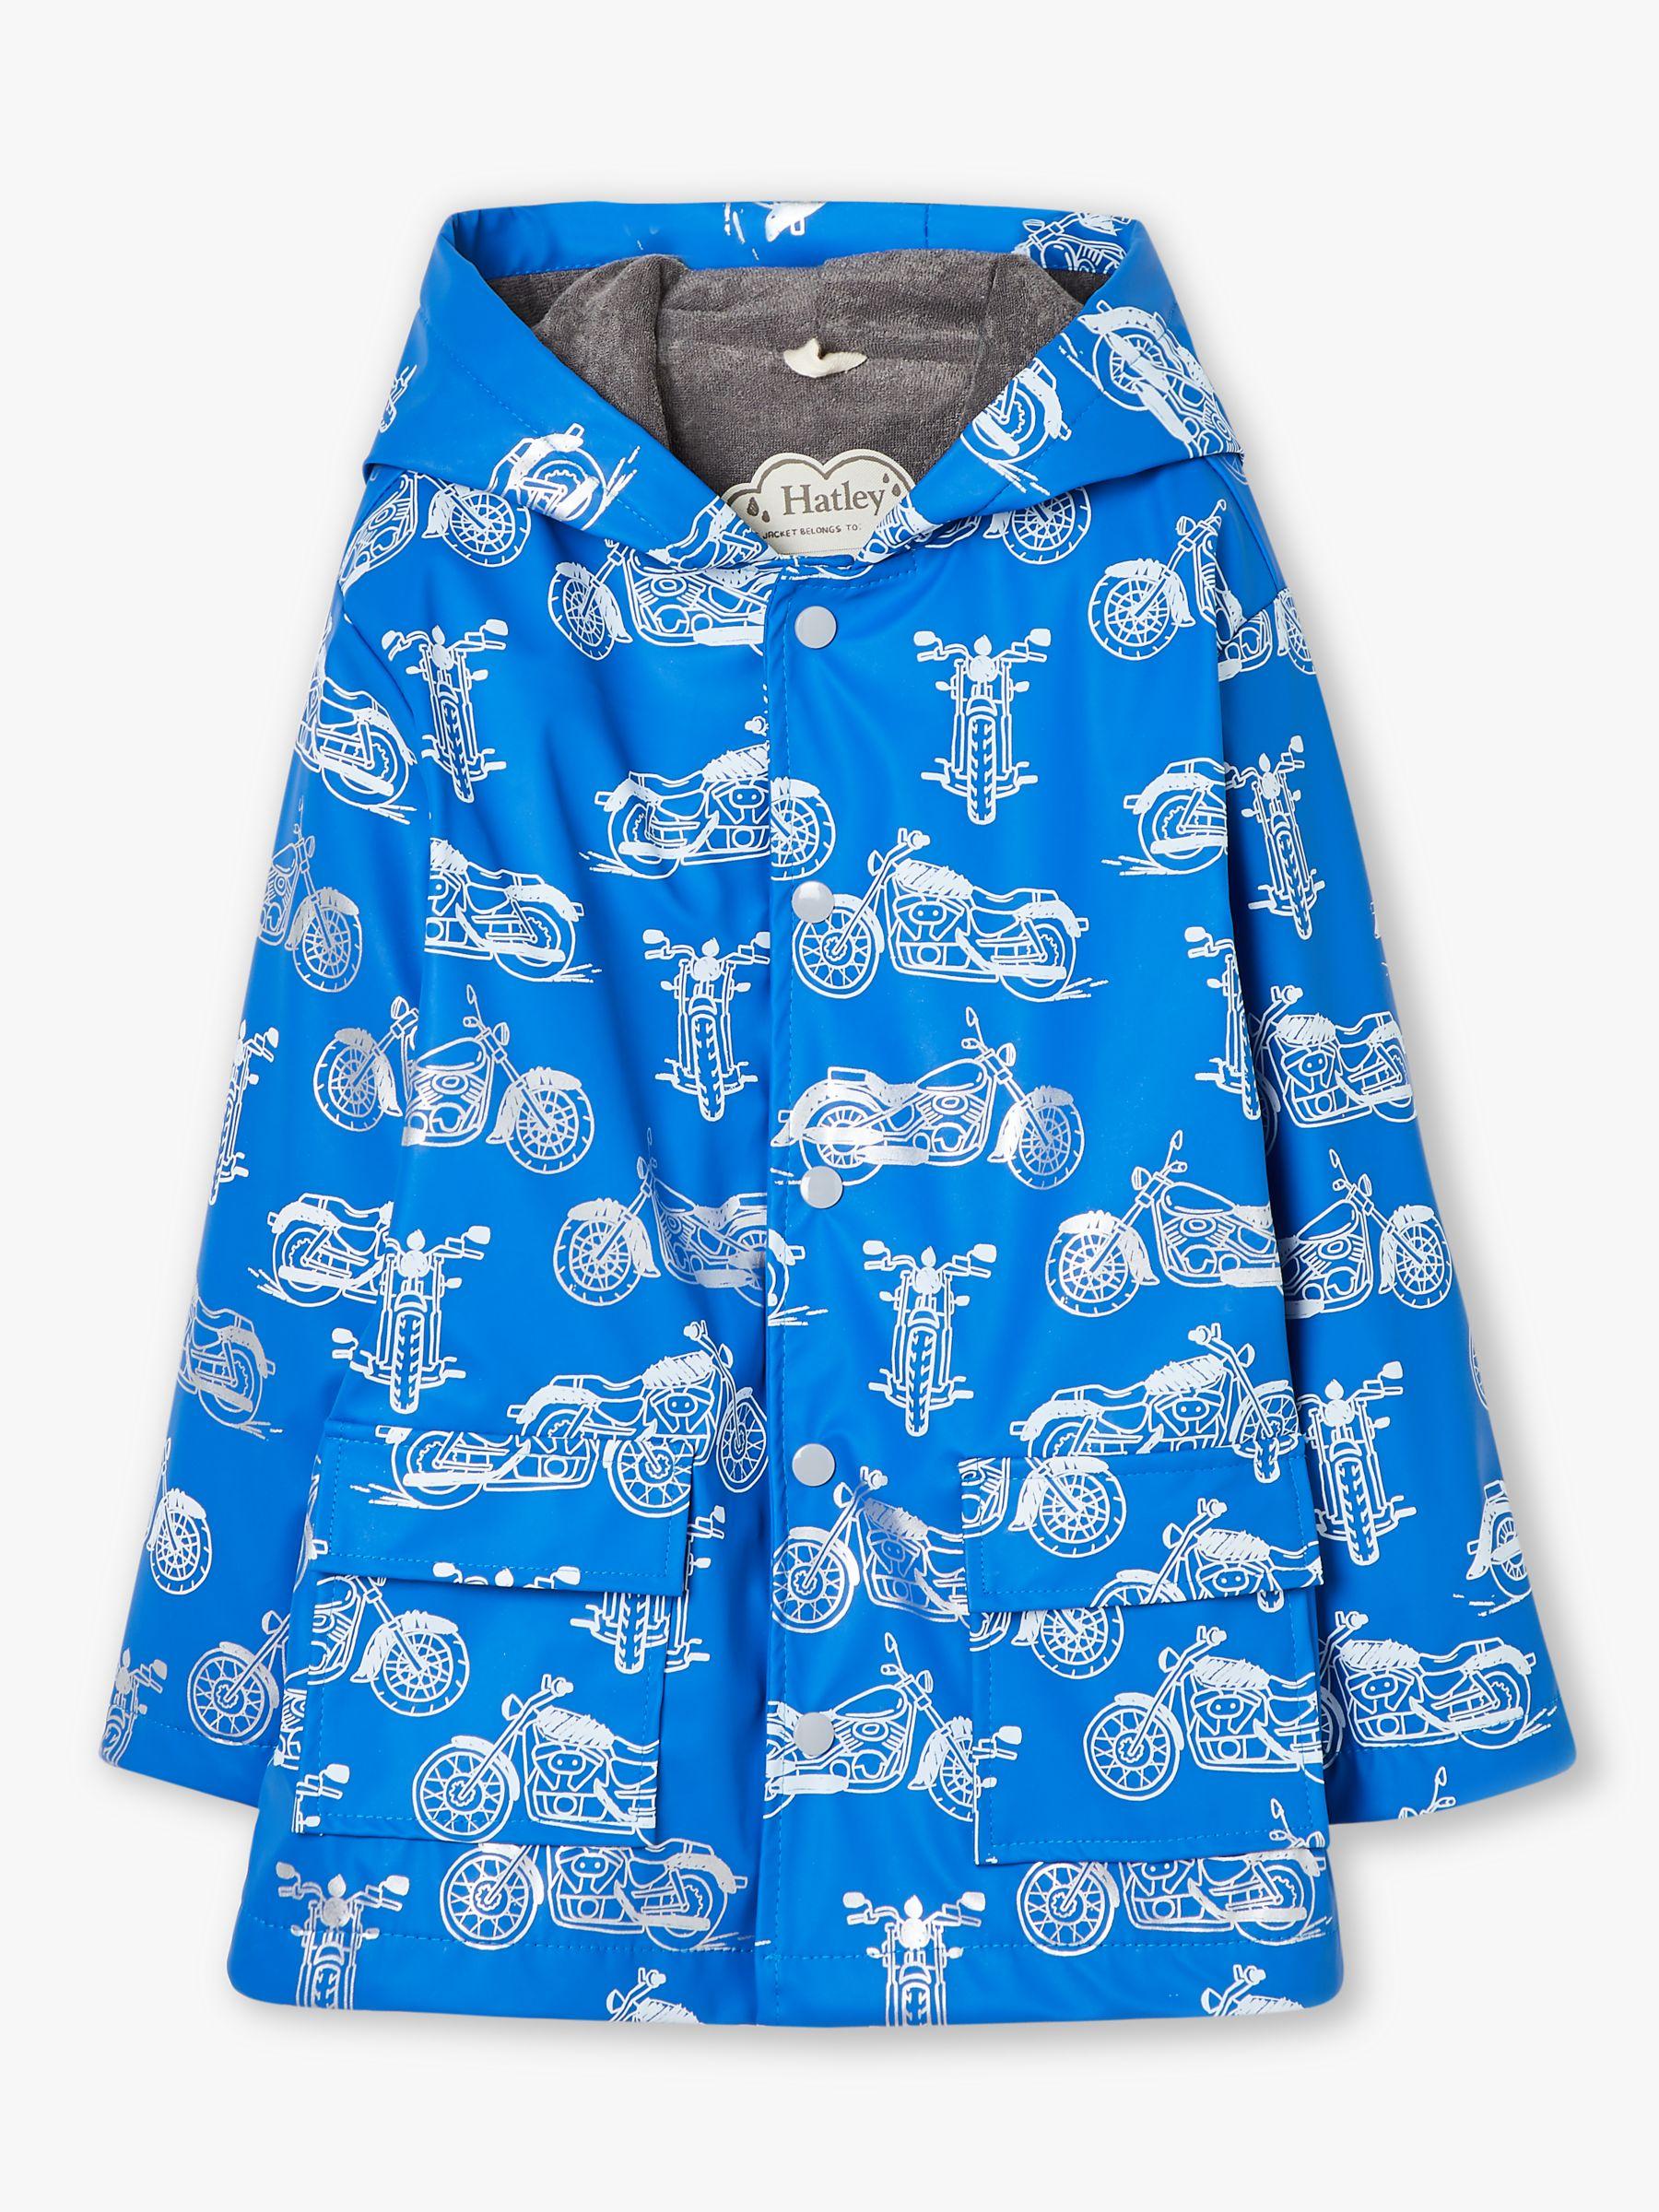 Hatley Hatley Boys' Motorcycle Print Raincoat, Blue